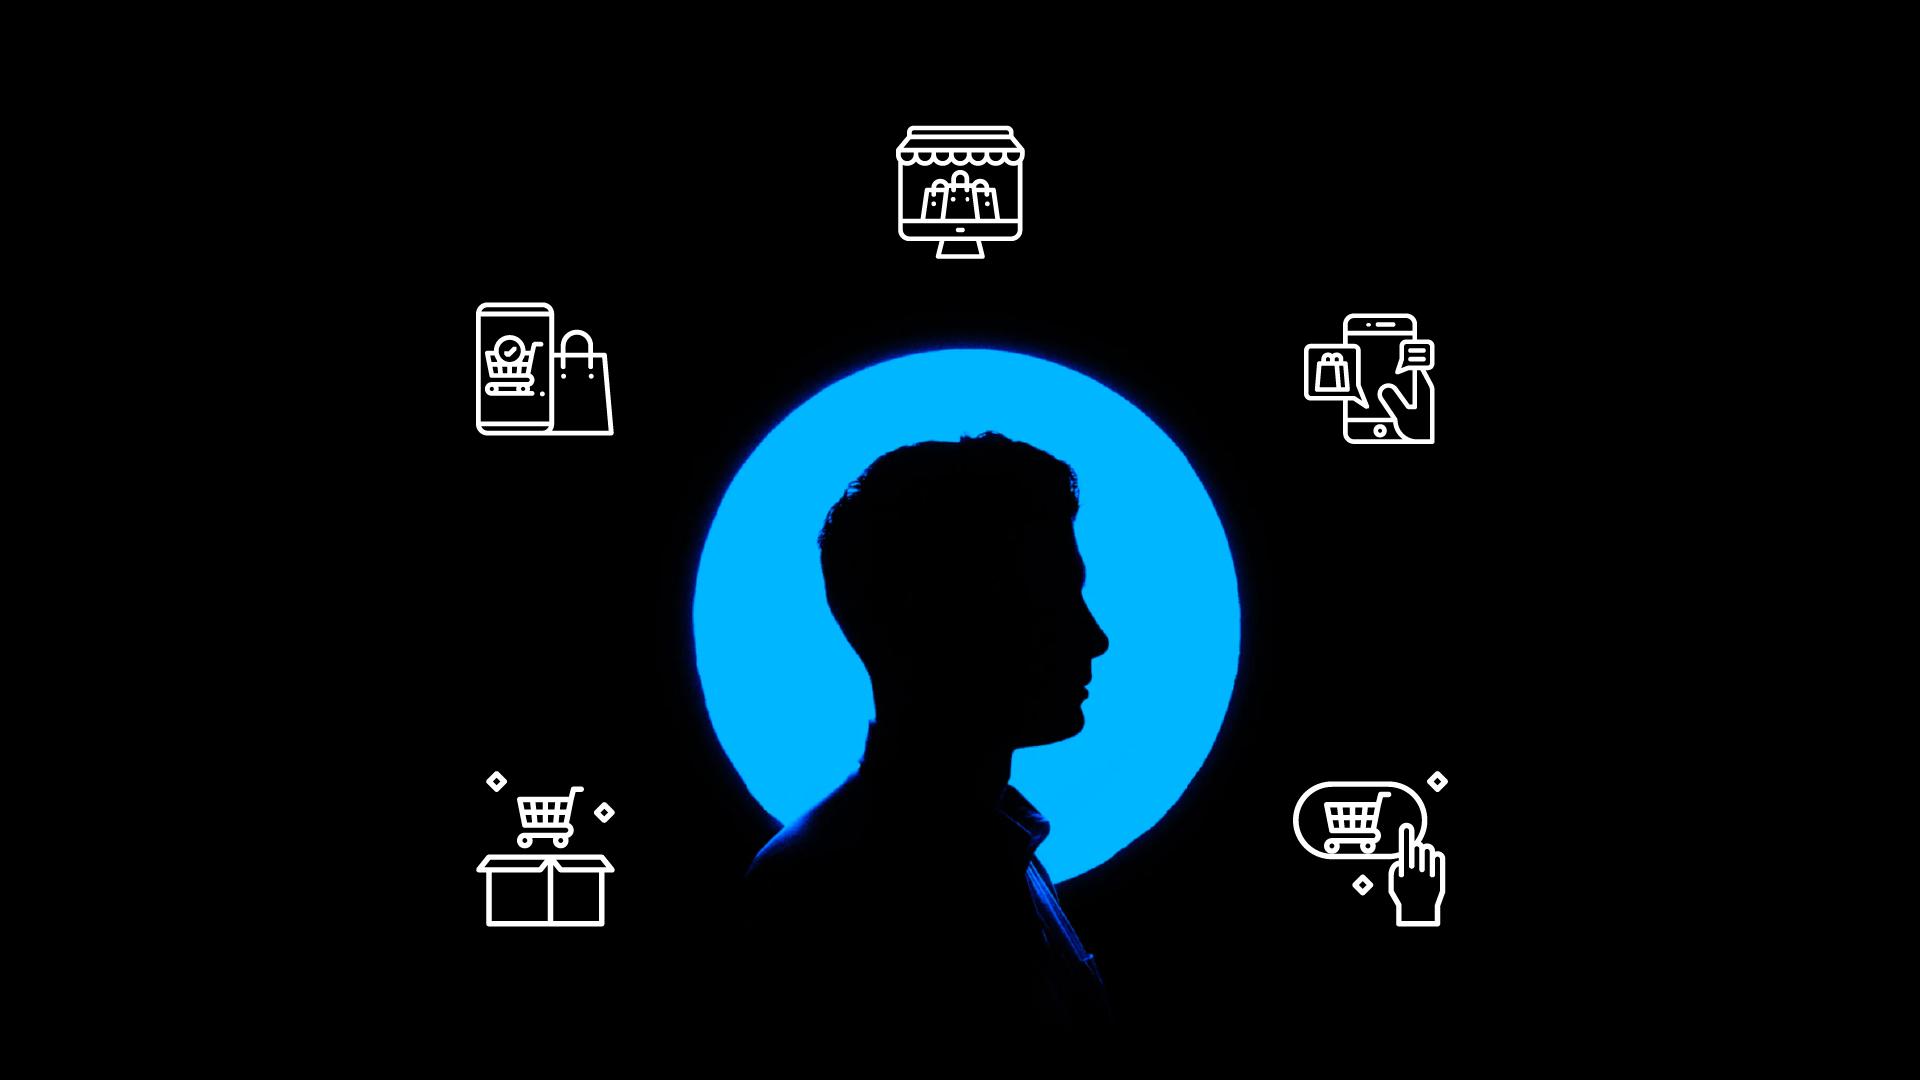 Contentus Corporate Identity Golden Ratio Logotype Design Process